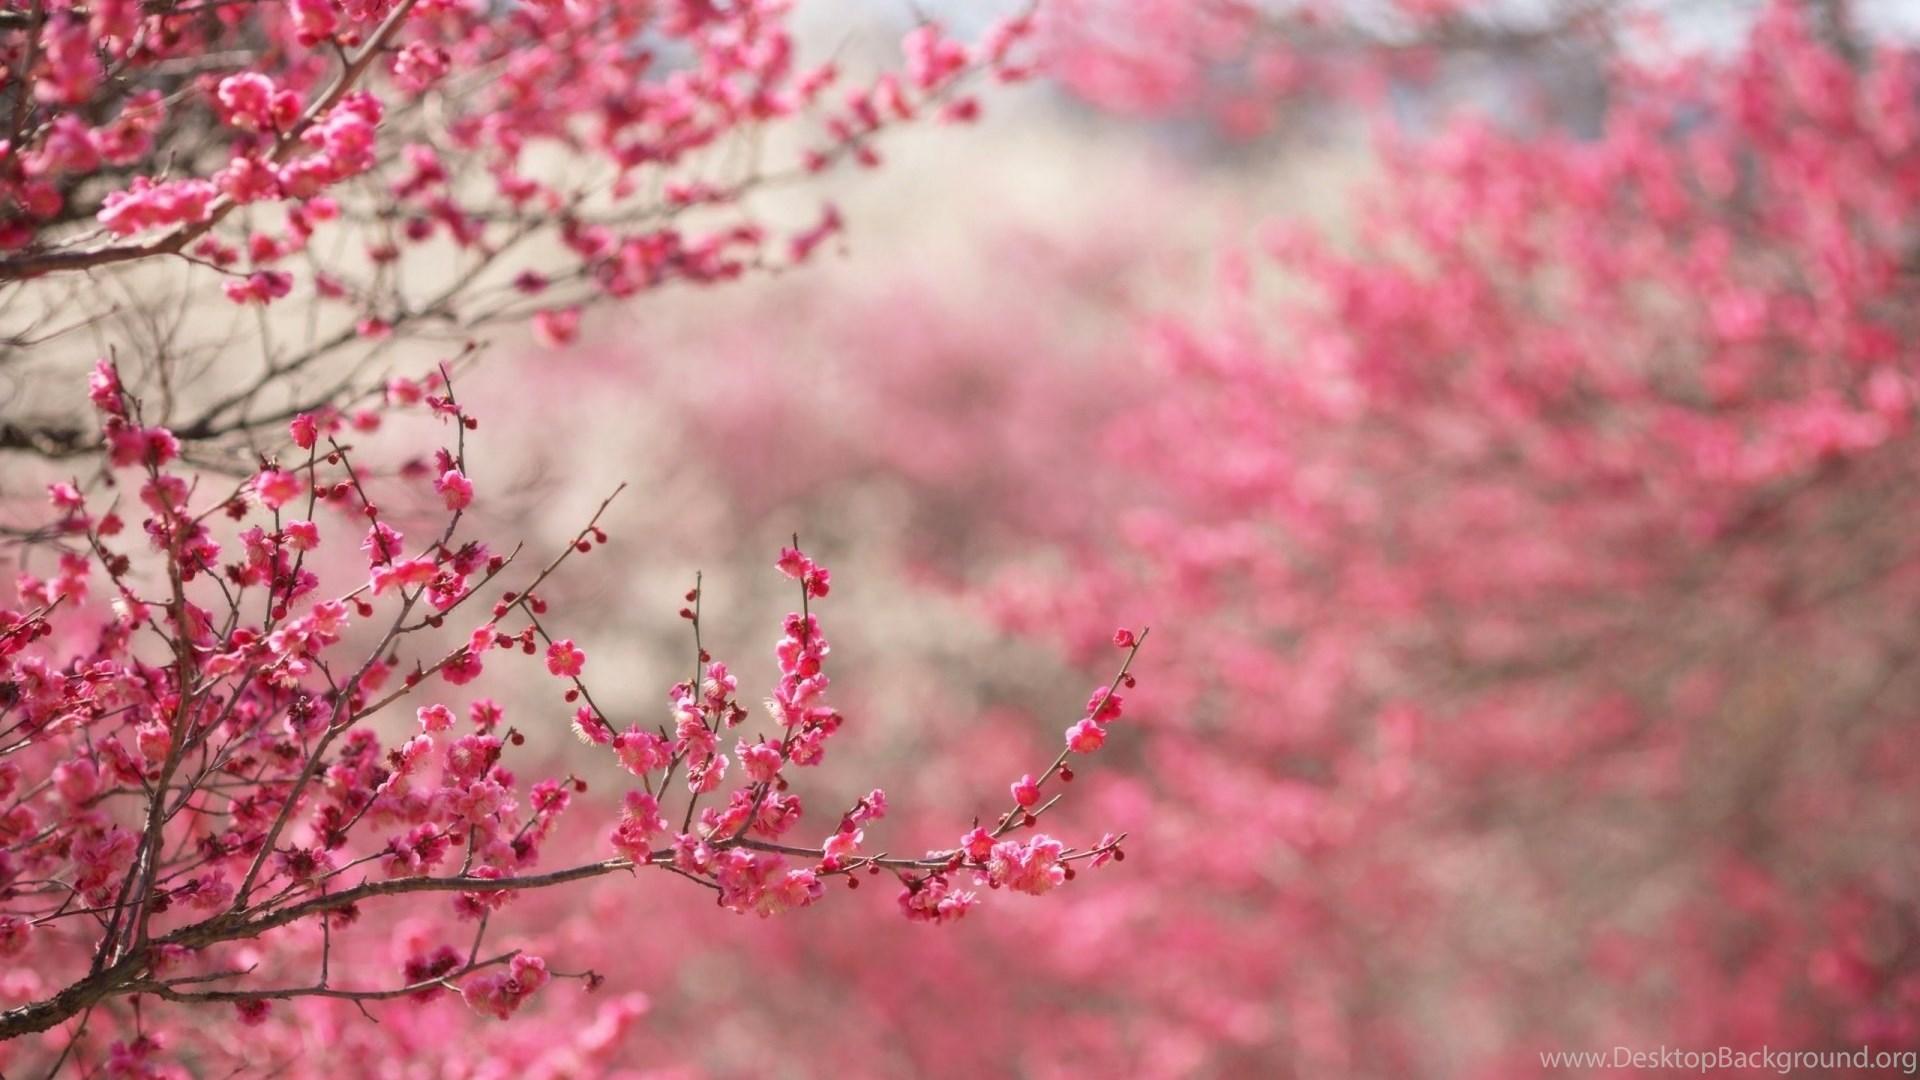 Pink Flowers Wallpapers Desktop Background